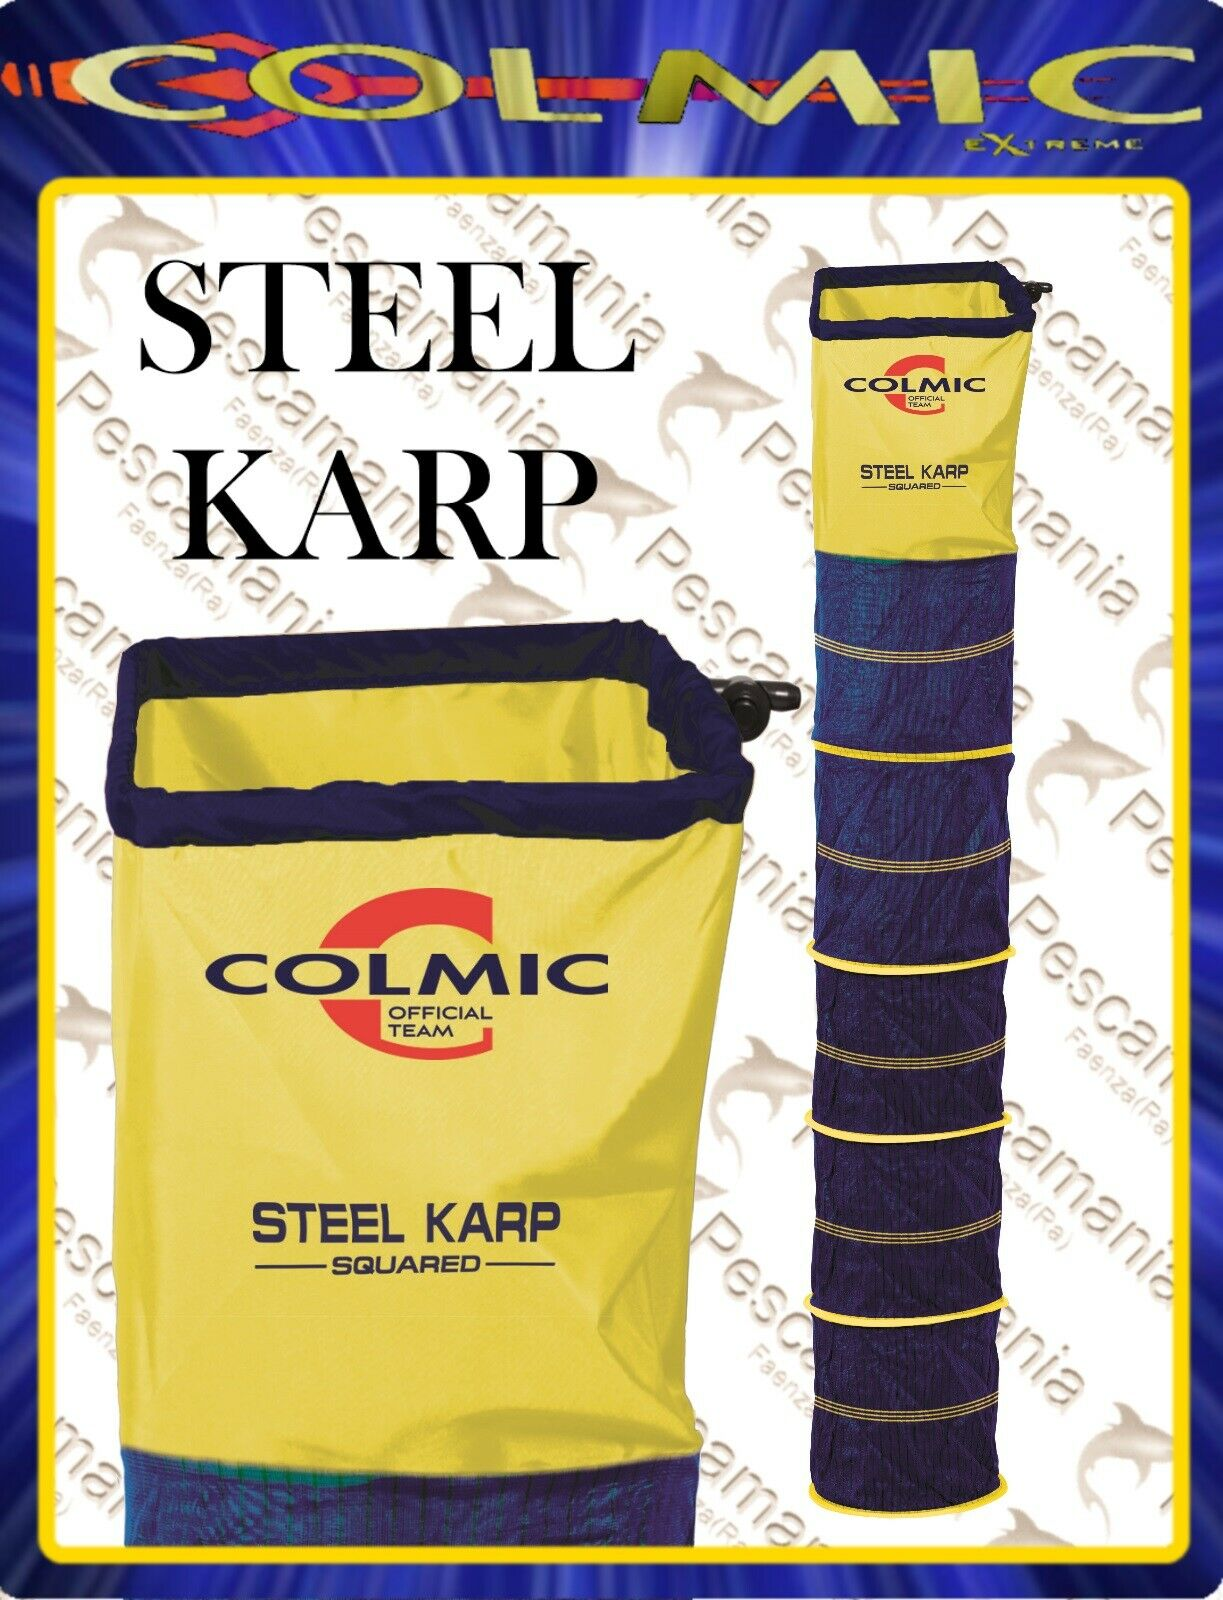 NASSA Colmic steel Karp squarot mt.2,50-3,00-3,50-4,00  | Online